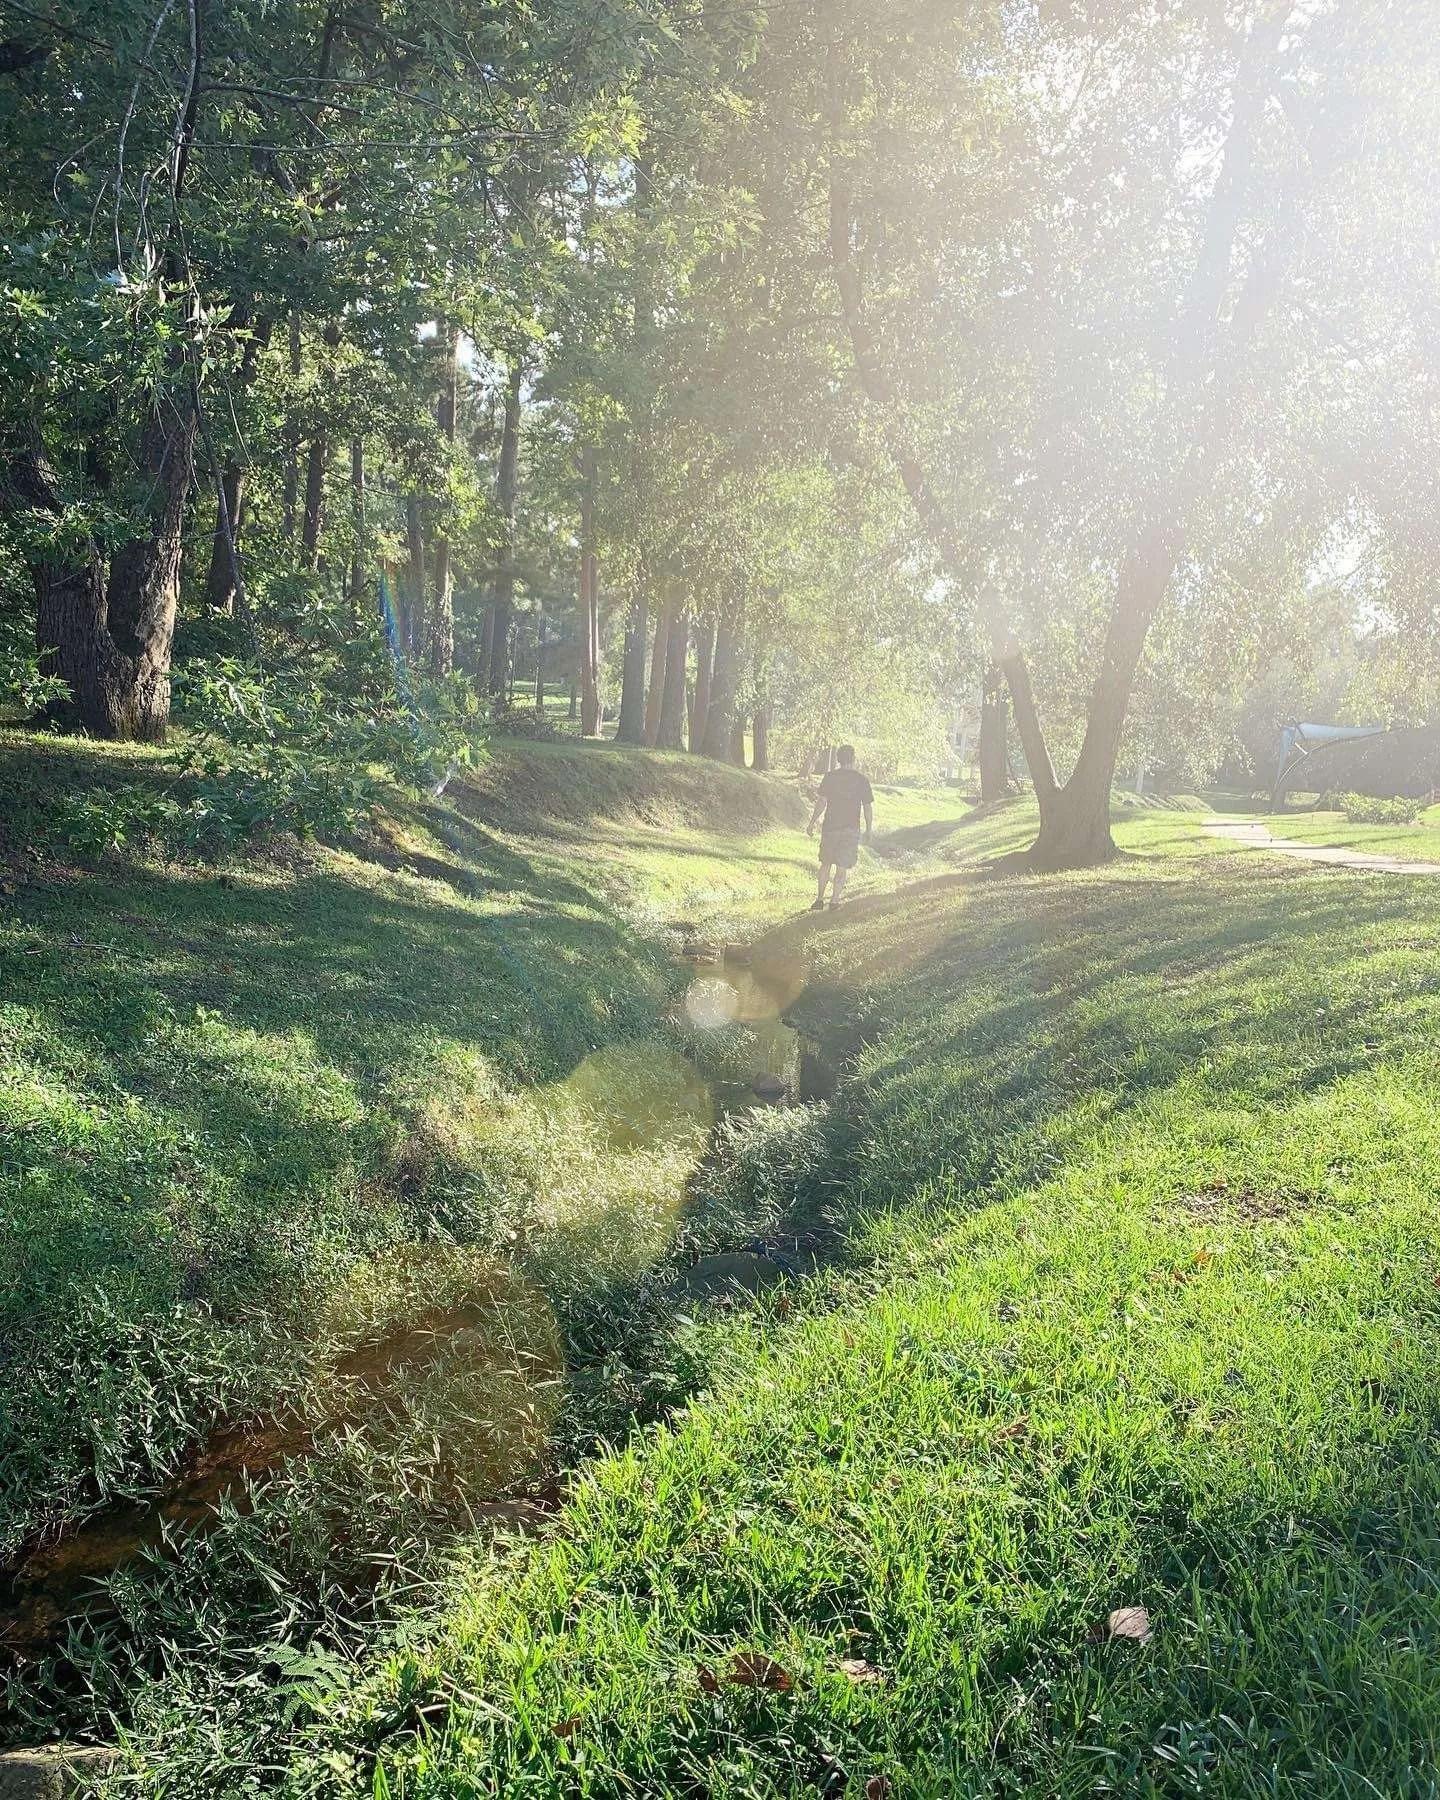 The BEST Fort Bragg and North Carolina Bucket List